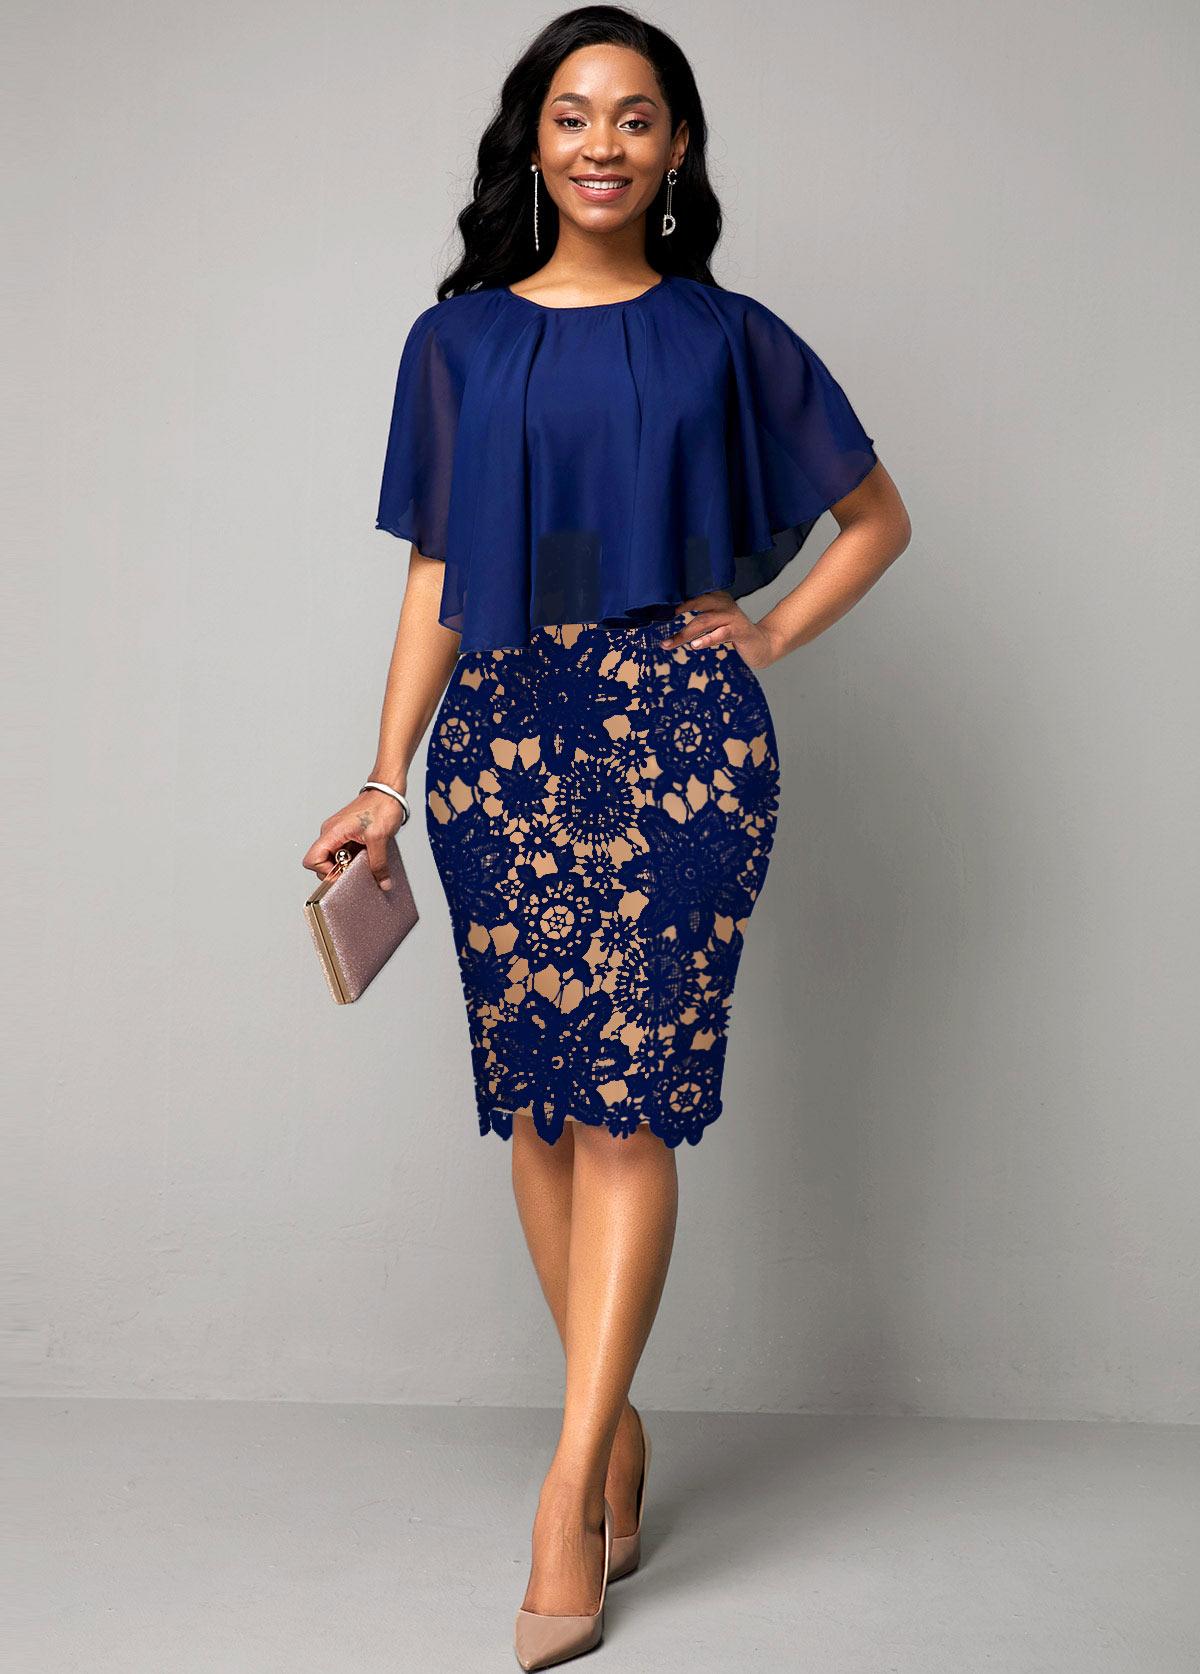 Lace Panel Cape Sleeve Navy Blue Dress